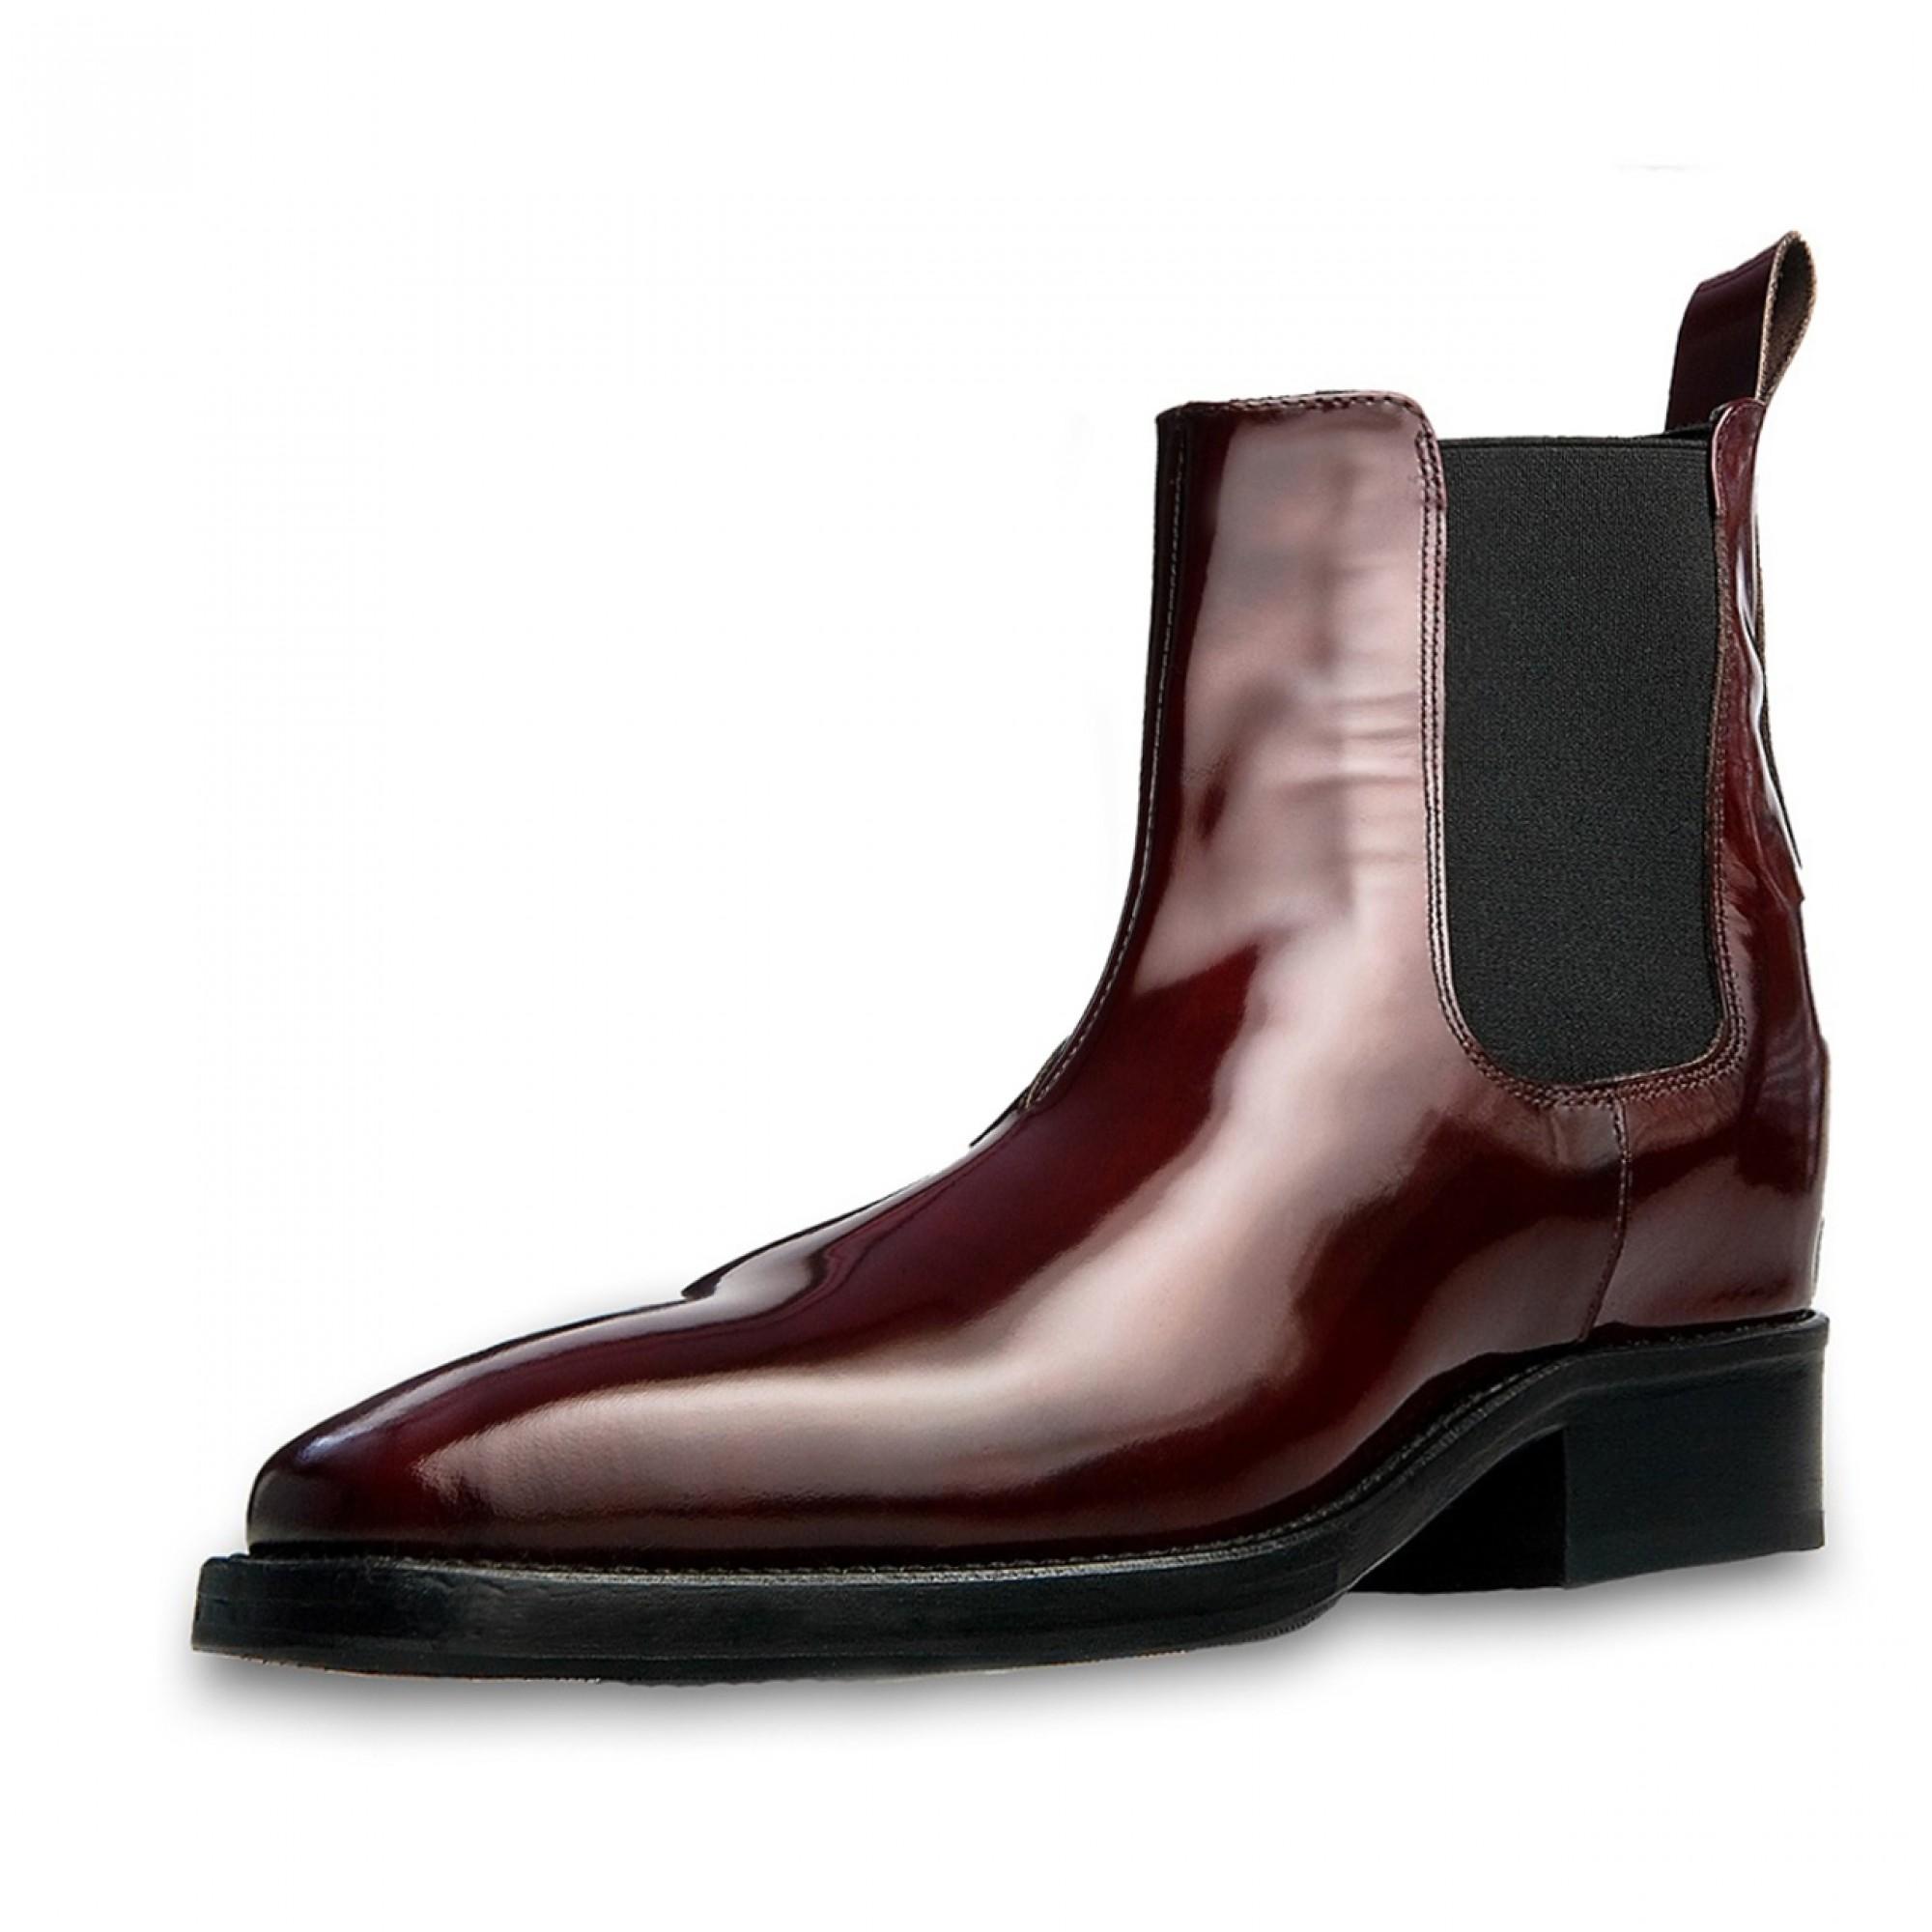 india elevator shoes